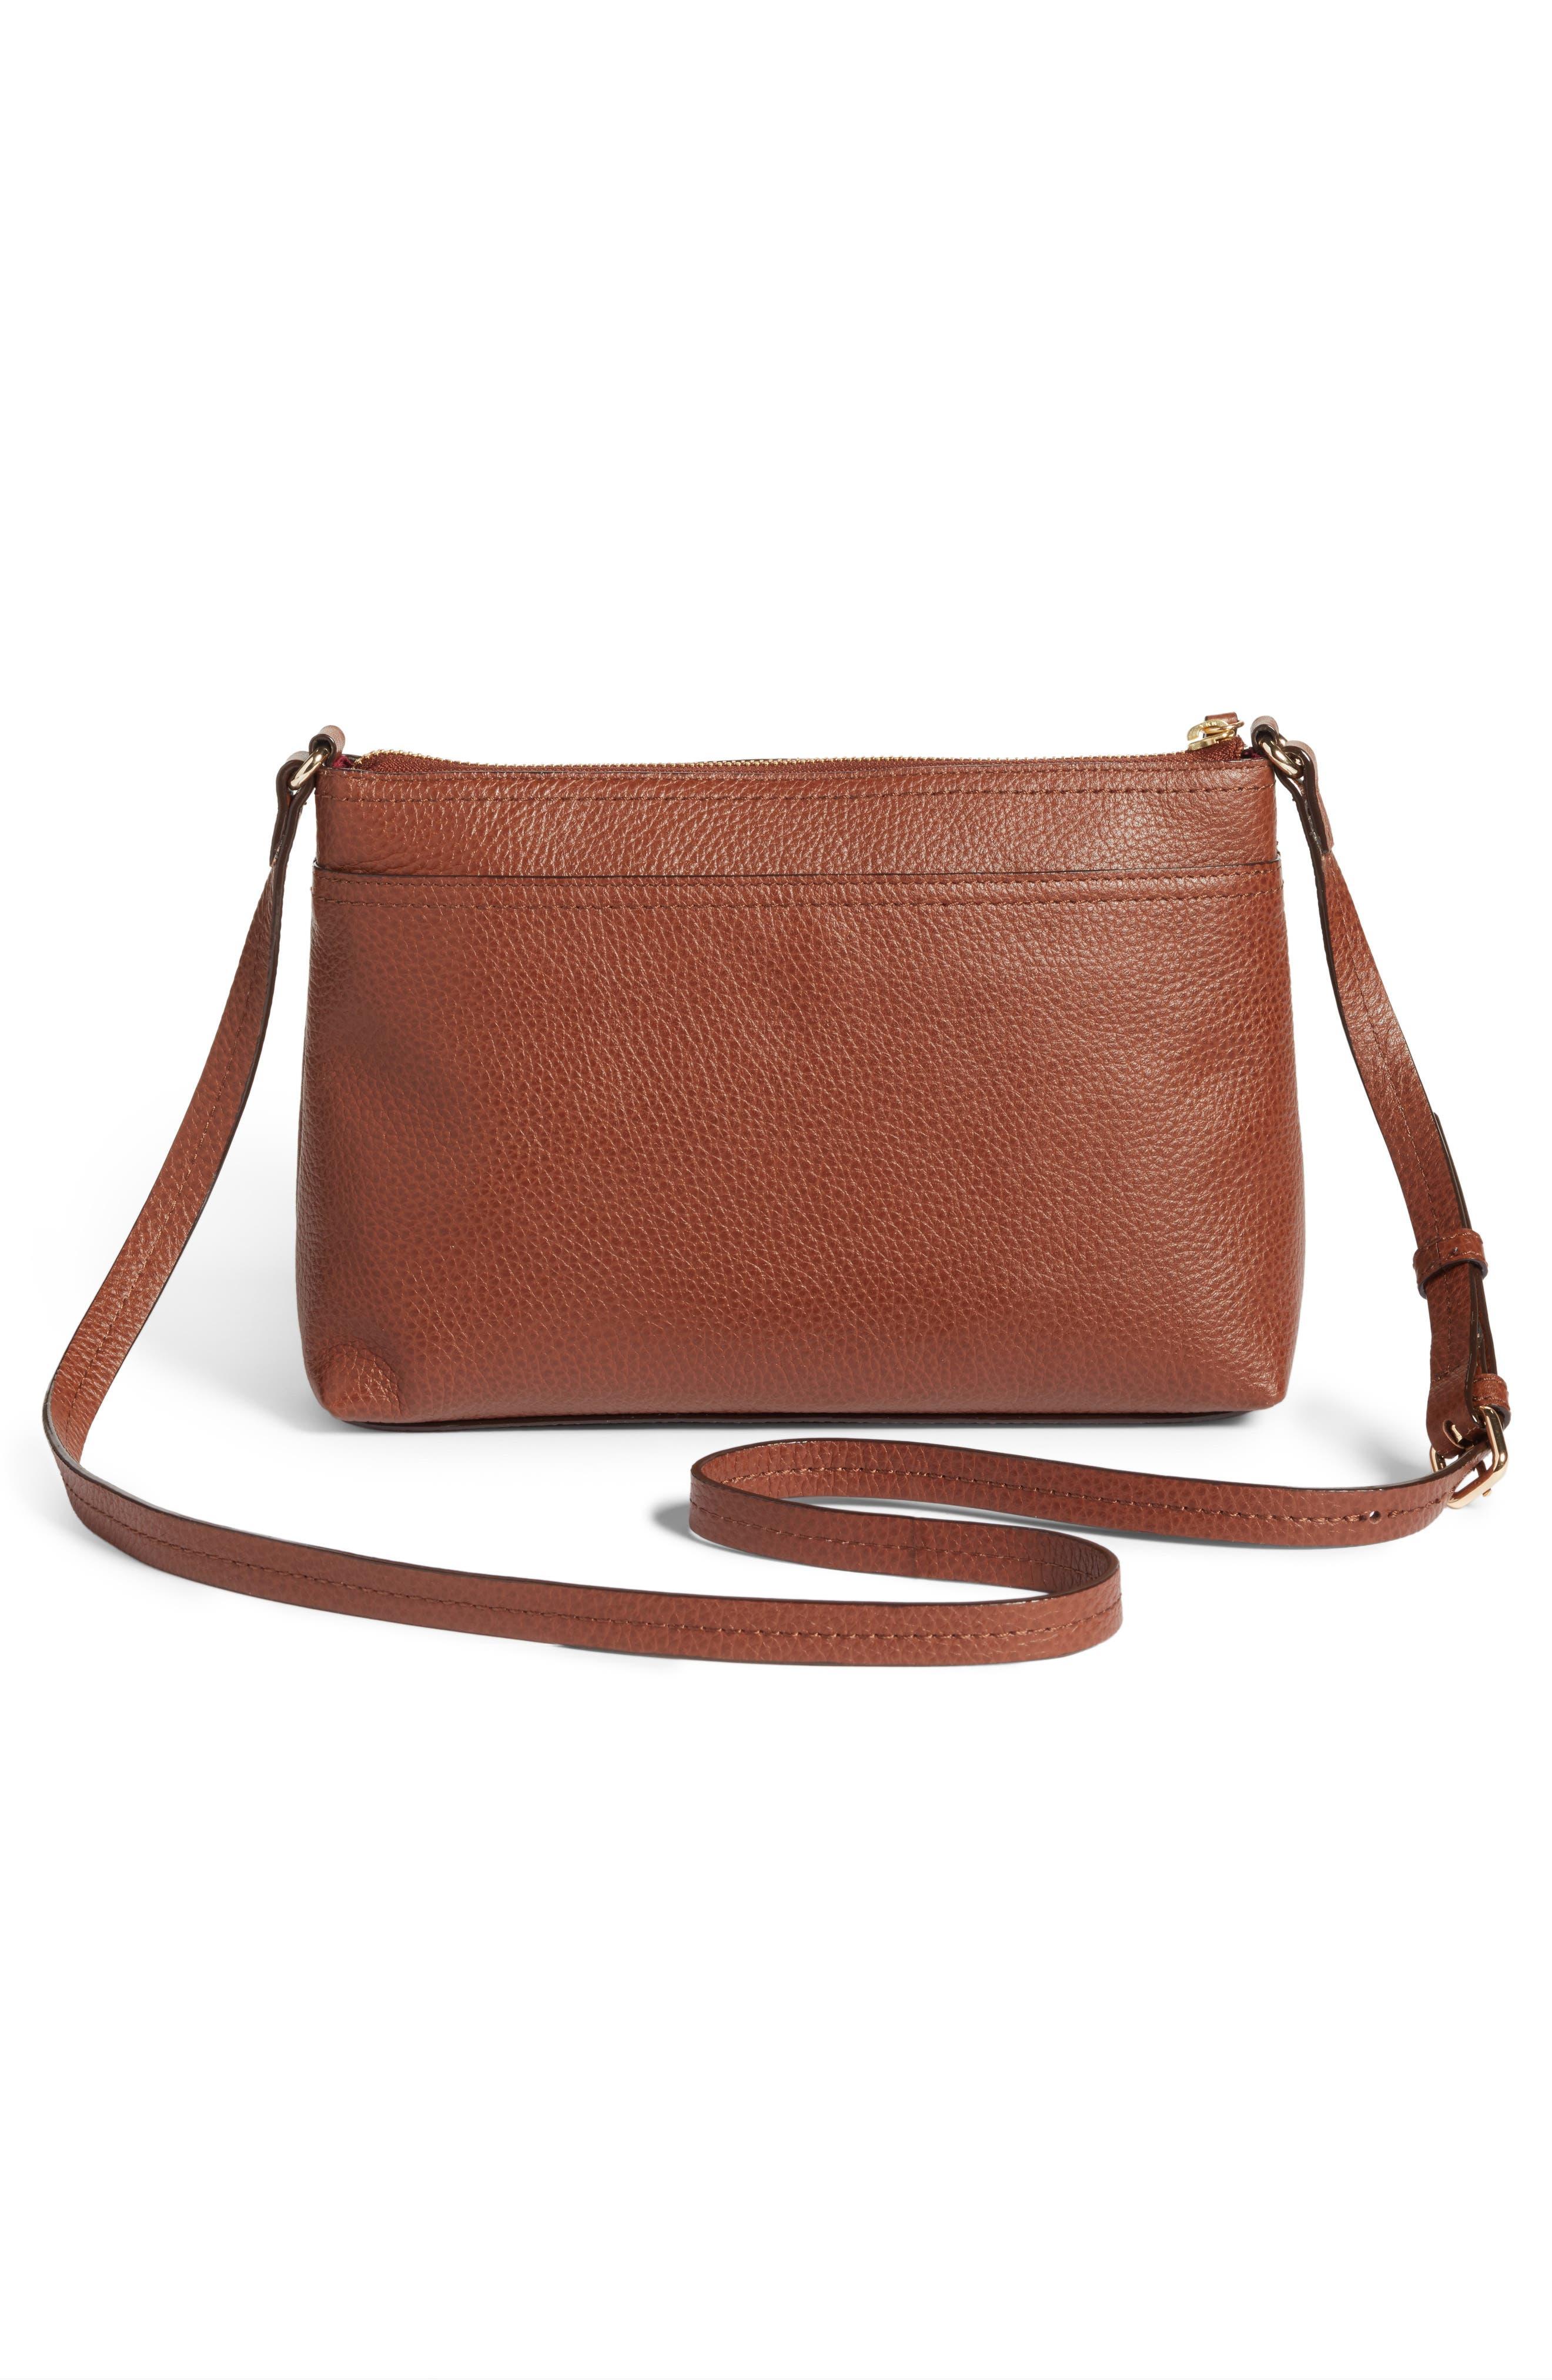 Alternate Image 3  - Nordstrom Pebbled Leather Crossbody Bag